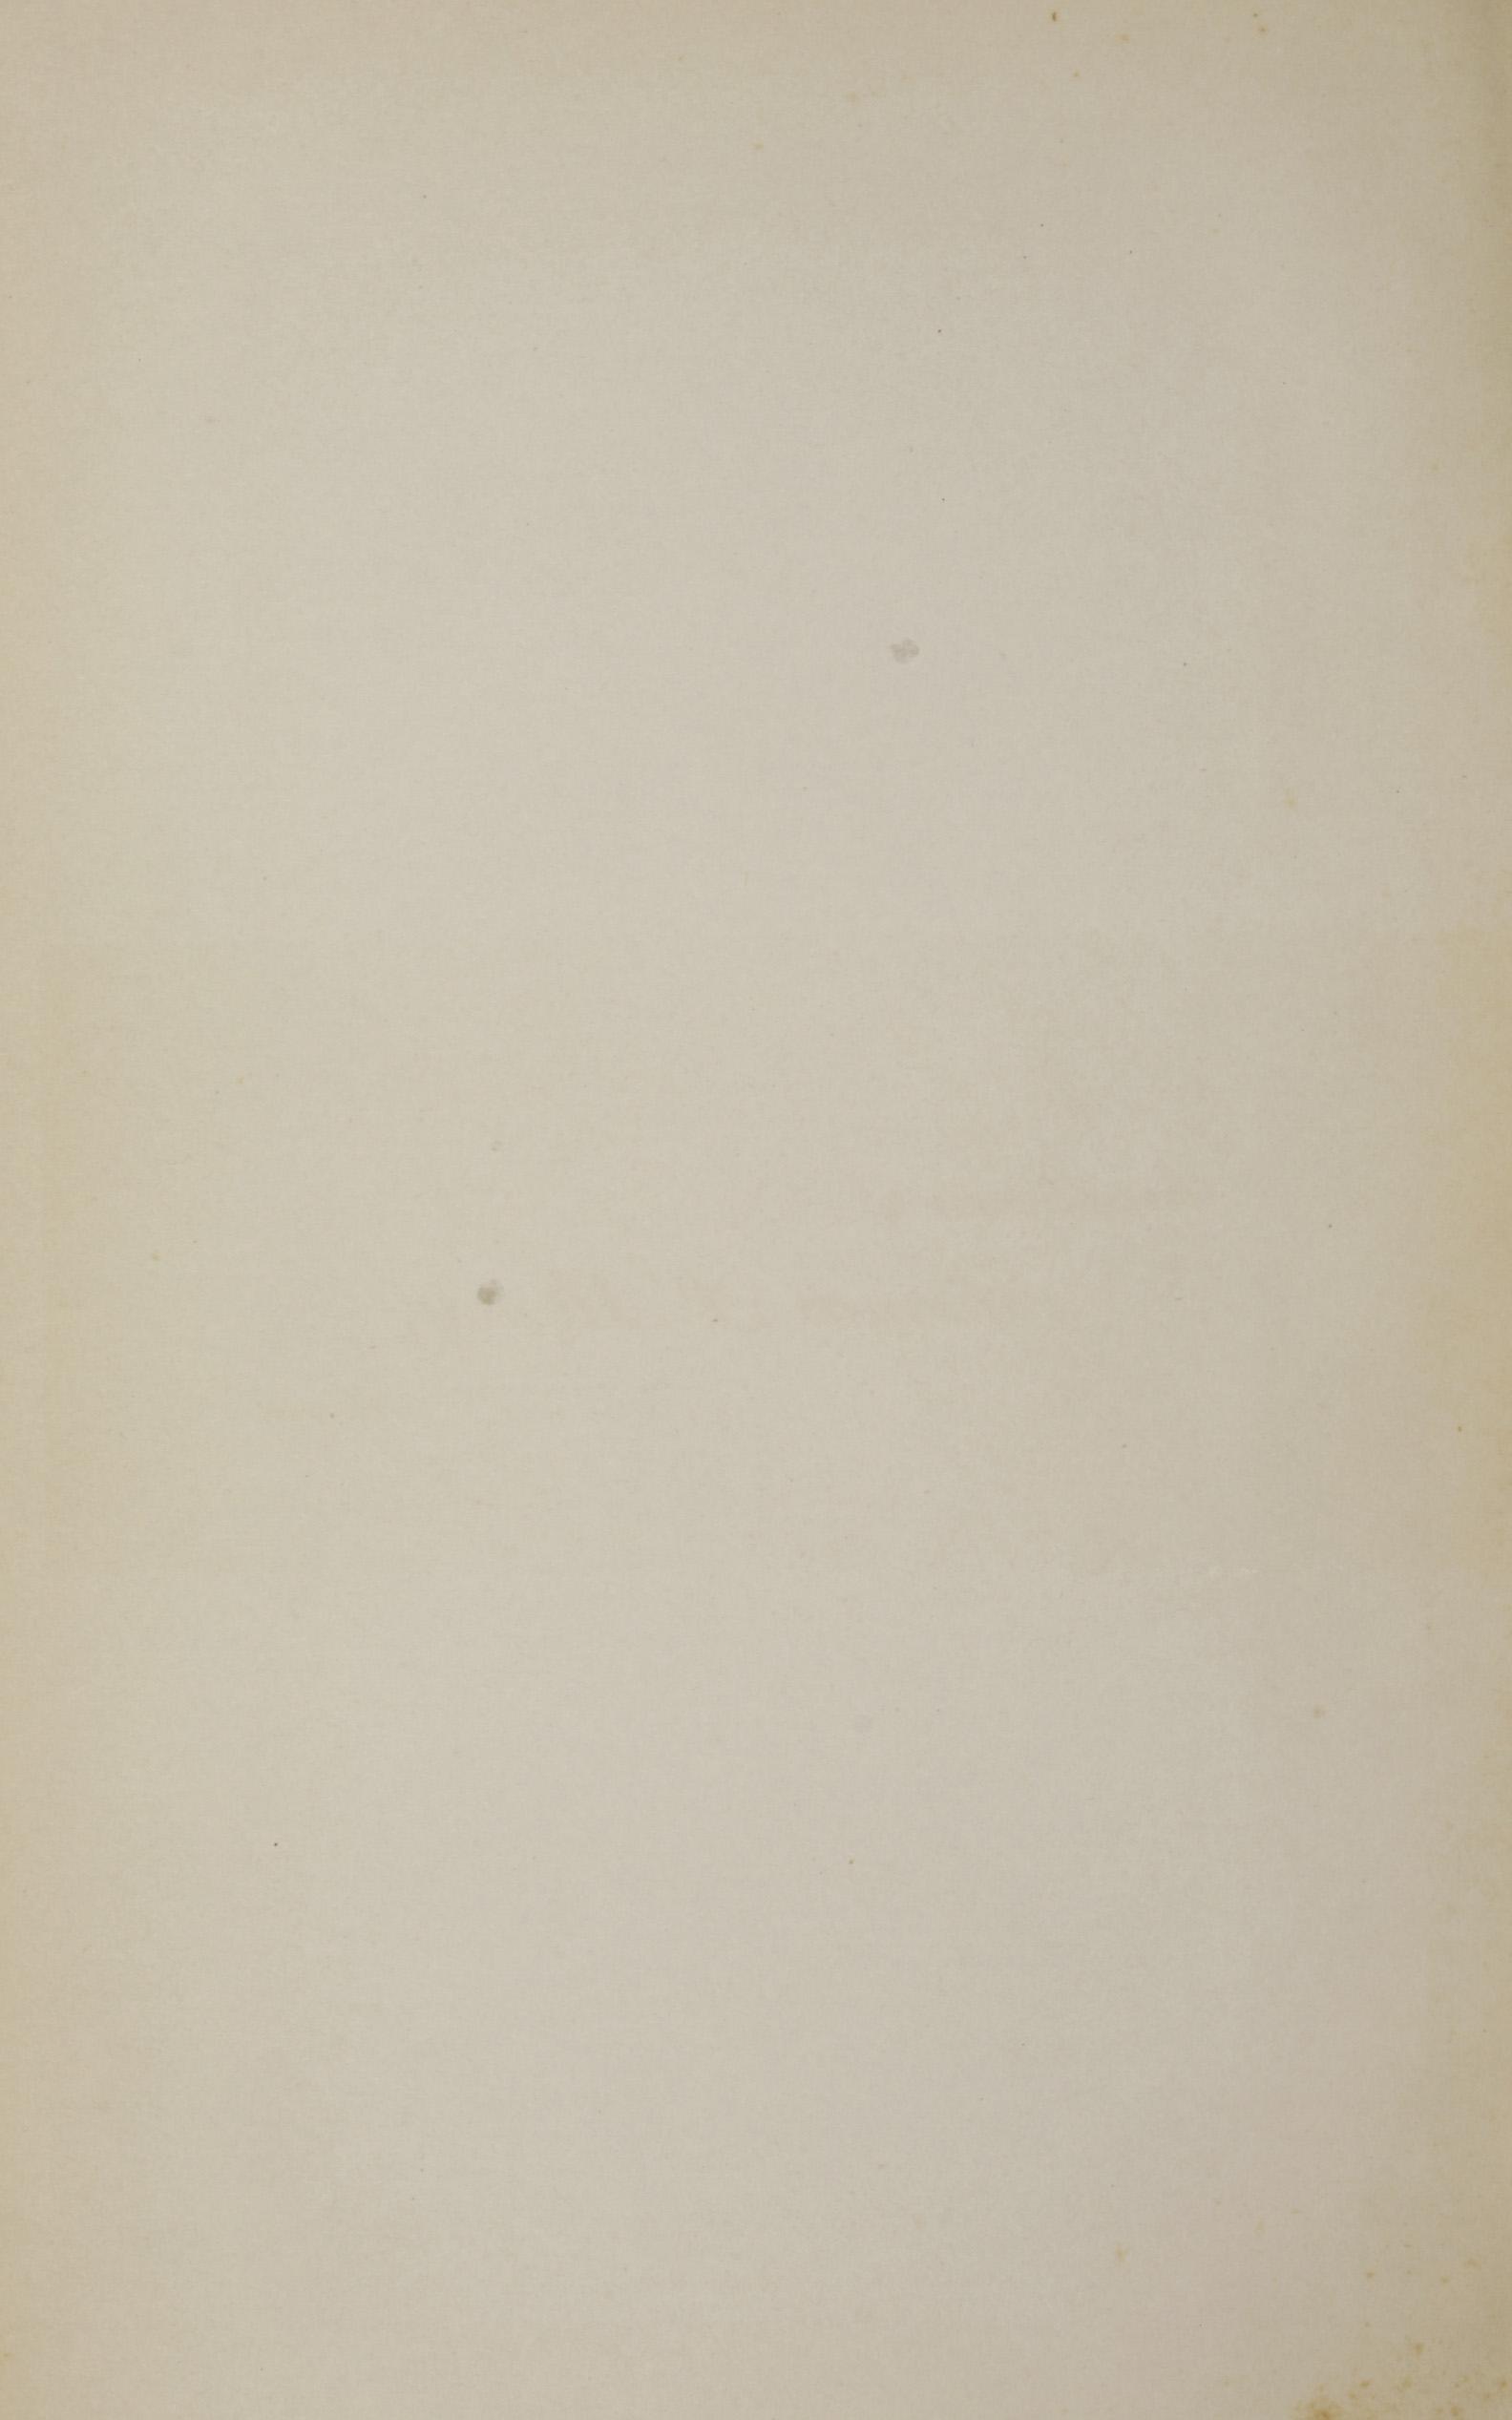 Charleston Yearbook, 1930, blank page